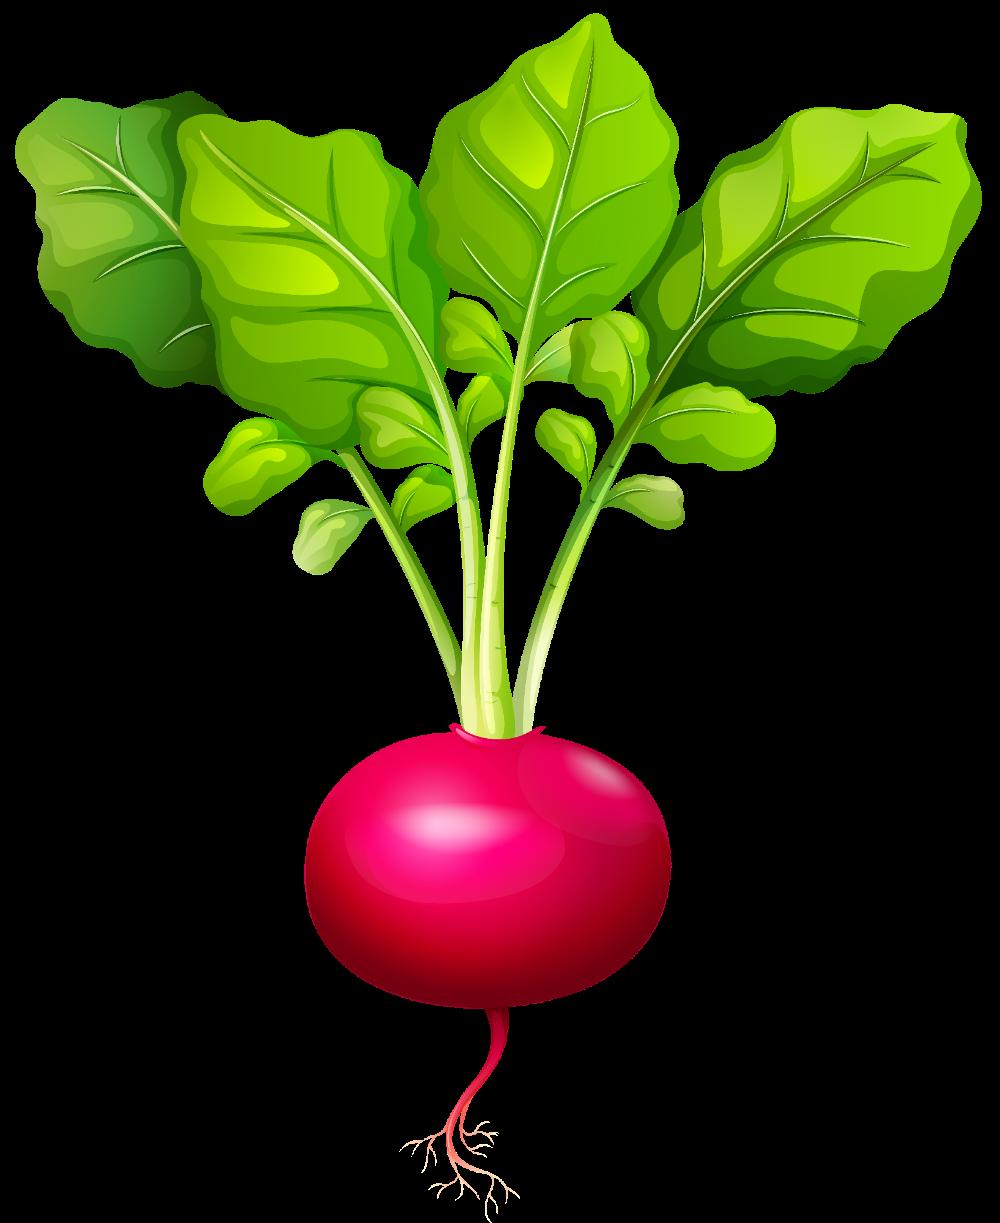 Cliparts Page 17 Best Clipart Images Download For You Vegetable Pictures Vegetables Vegetable Illustration